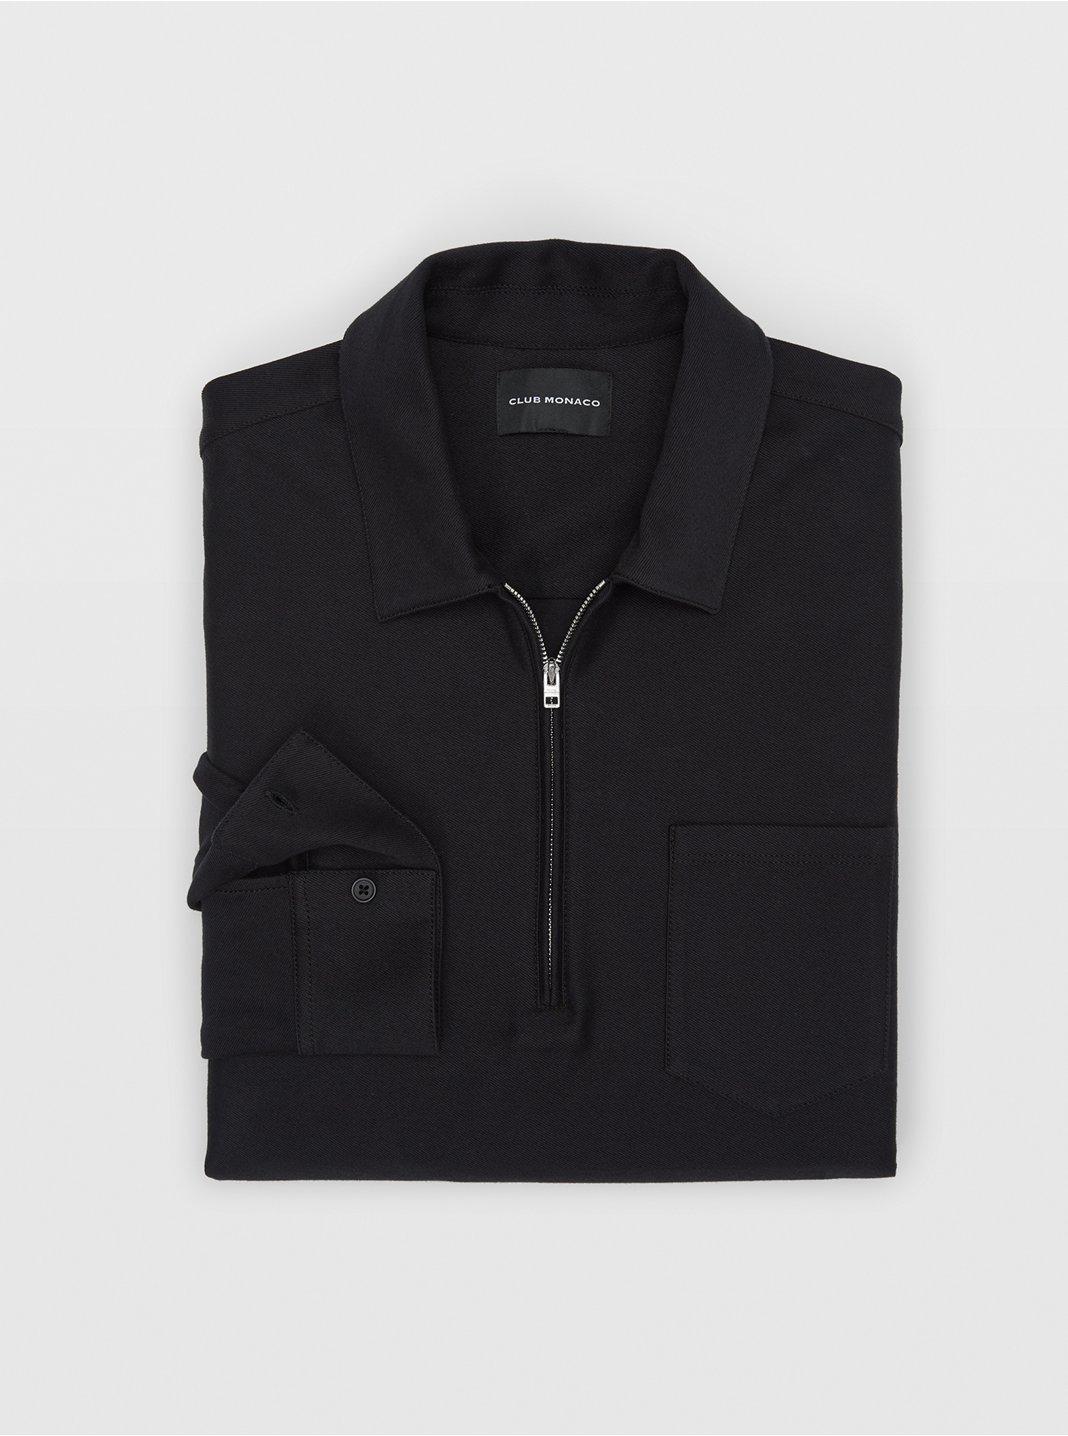 Twill Zip Pullover